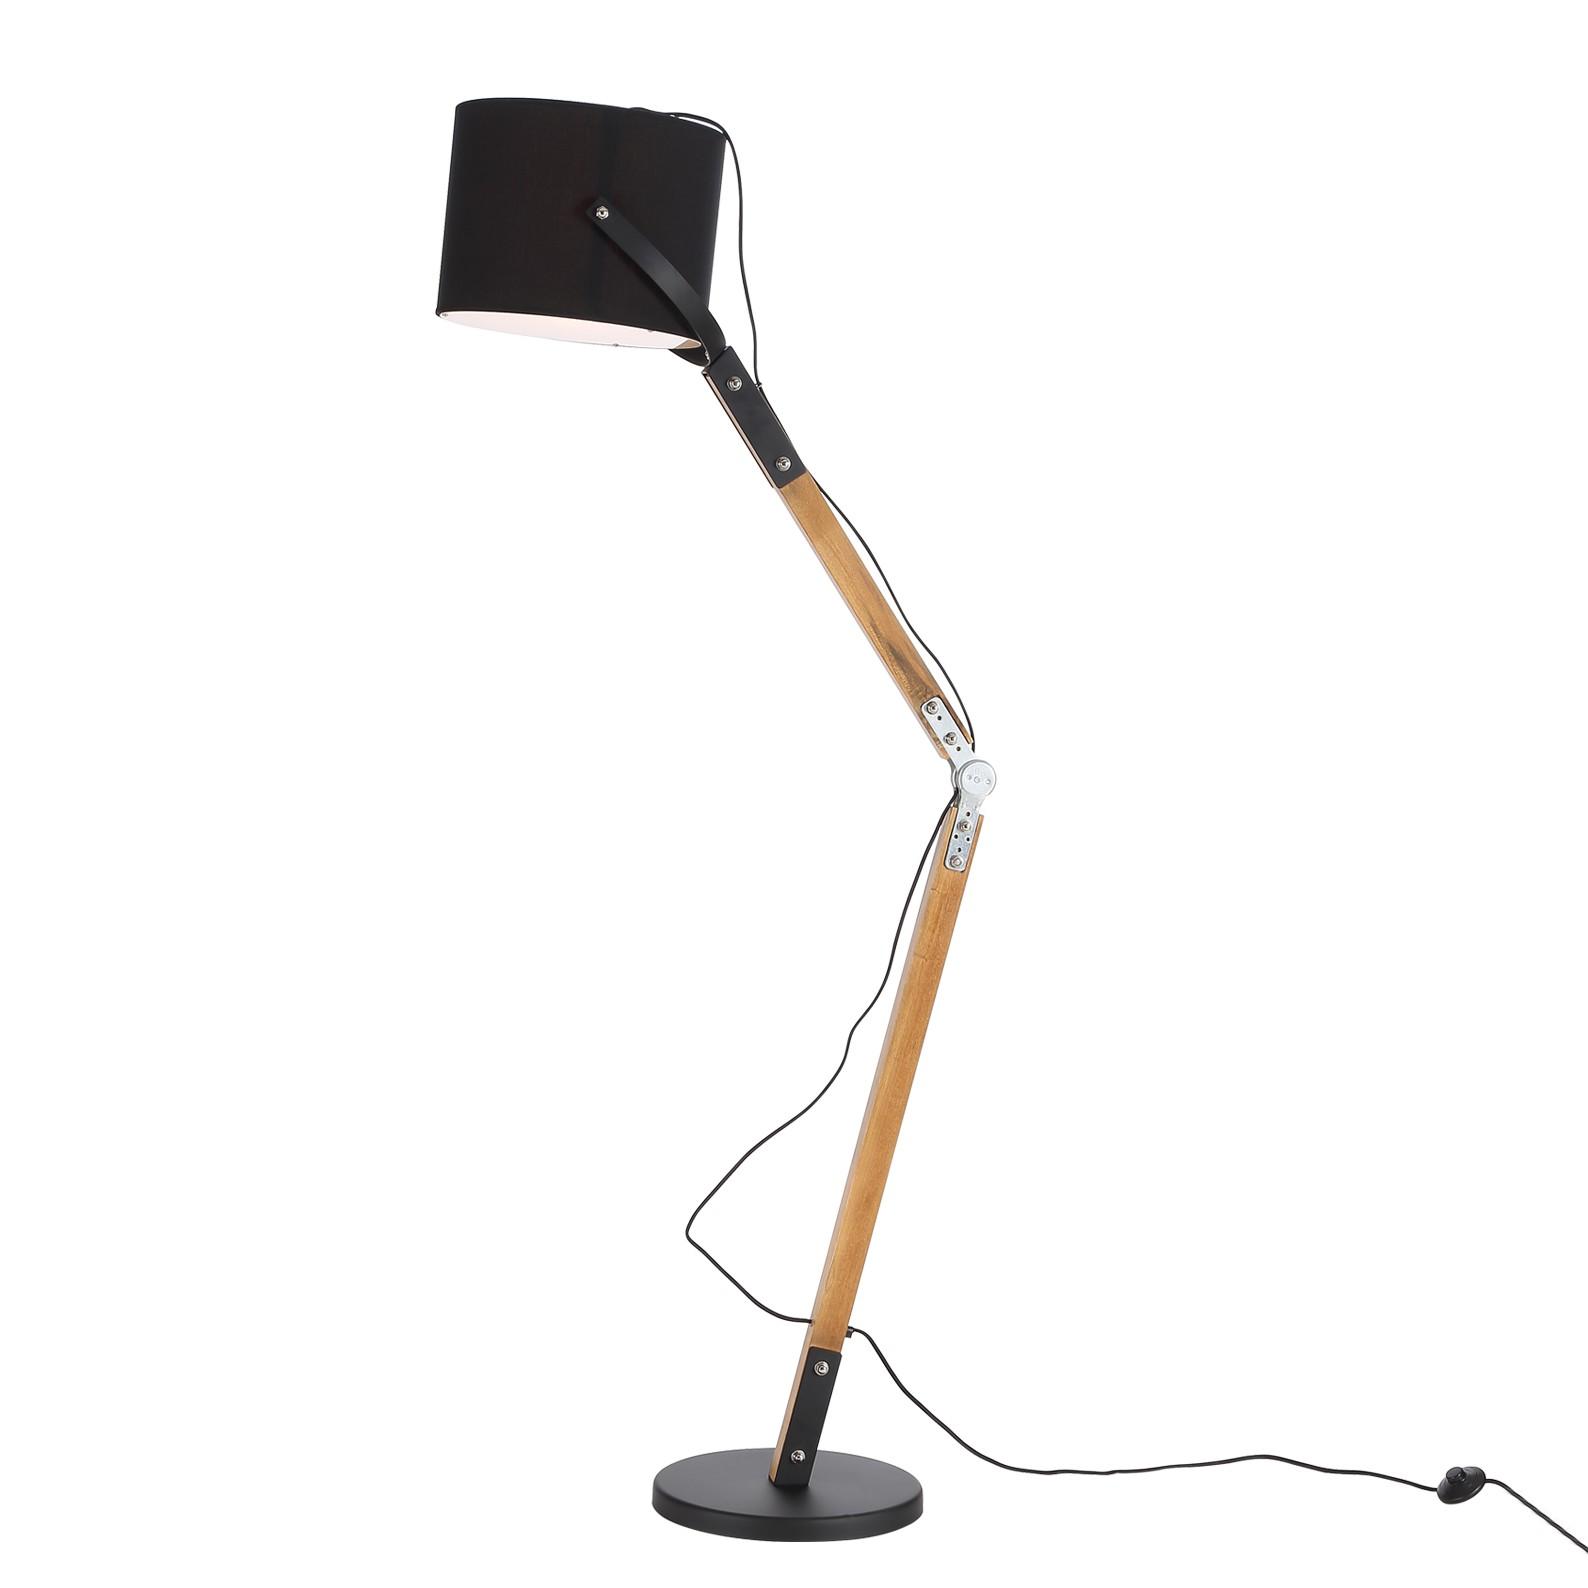 EEK A++, Lampadaire Snapshot - Noir 1 ampoule, Loistaa